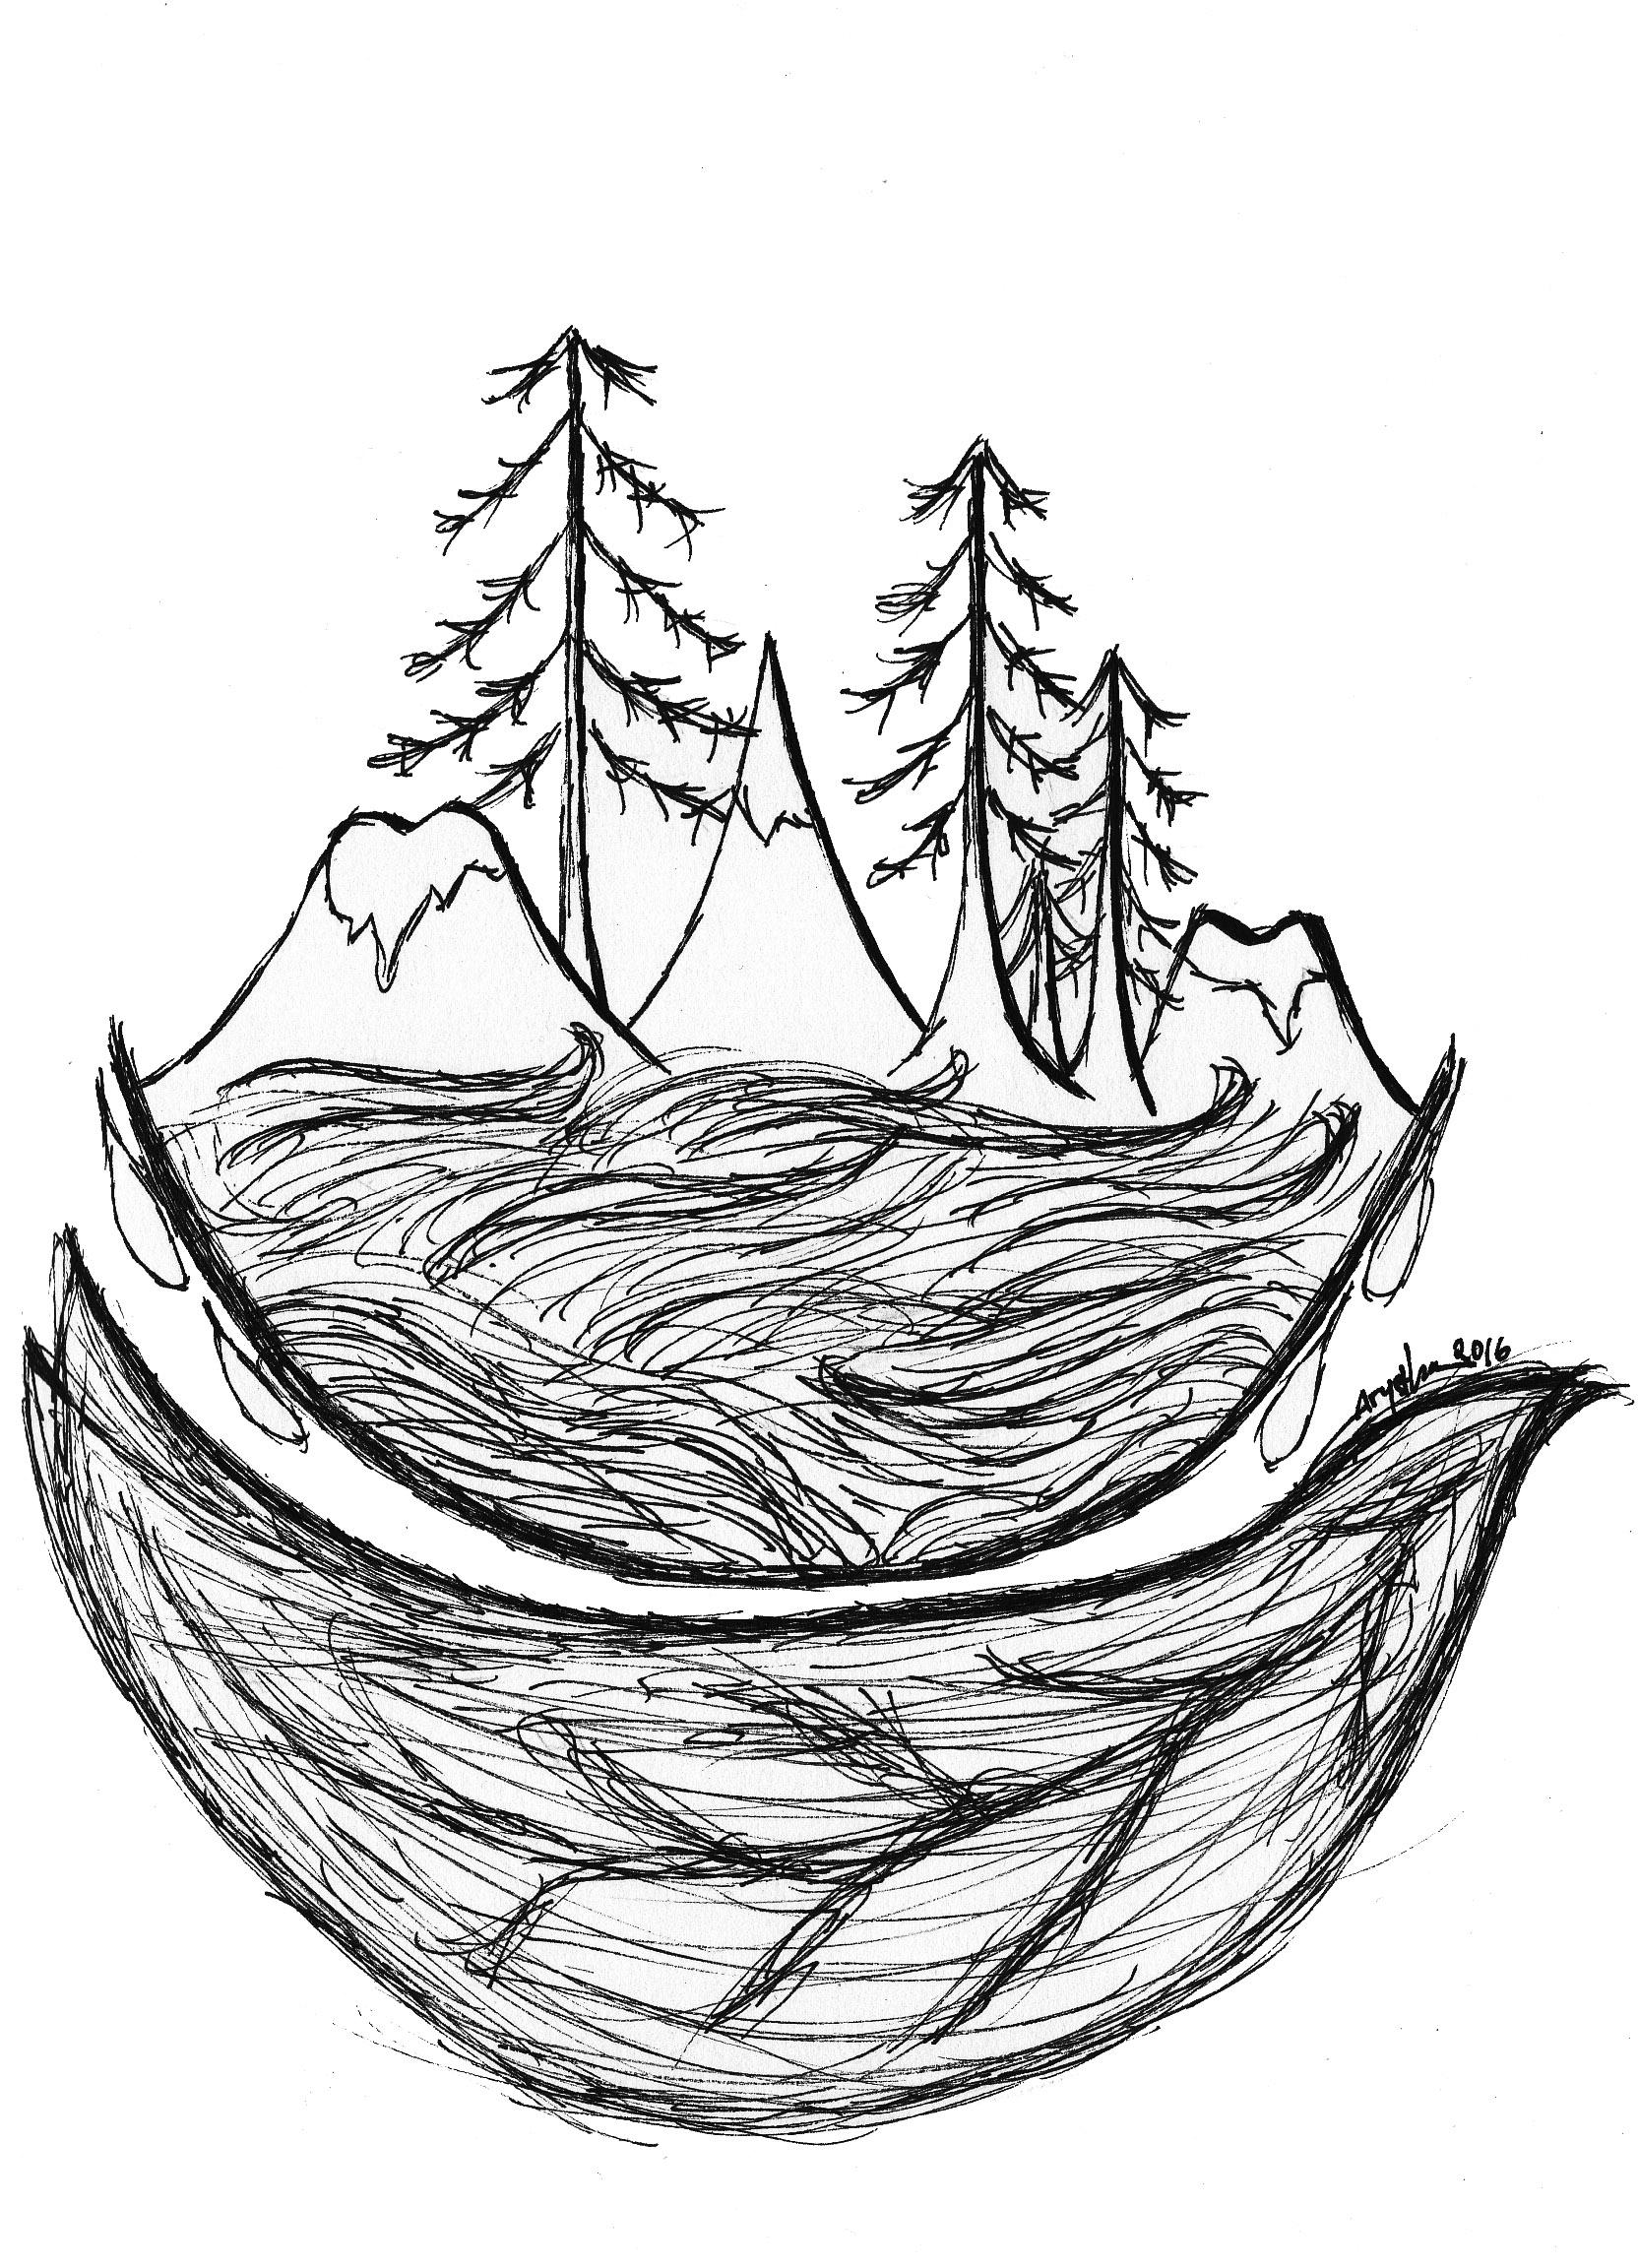 Illustration by Arystha Ayu P.